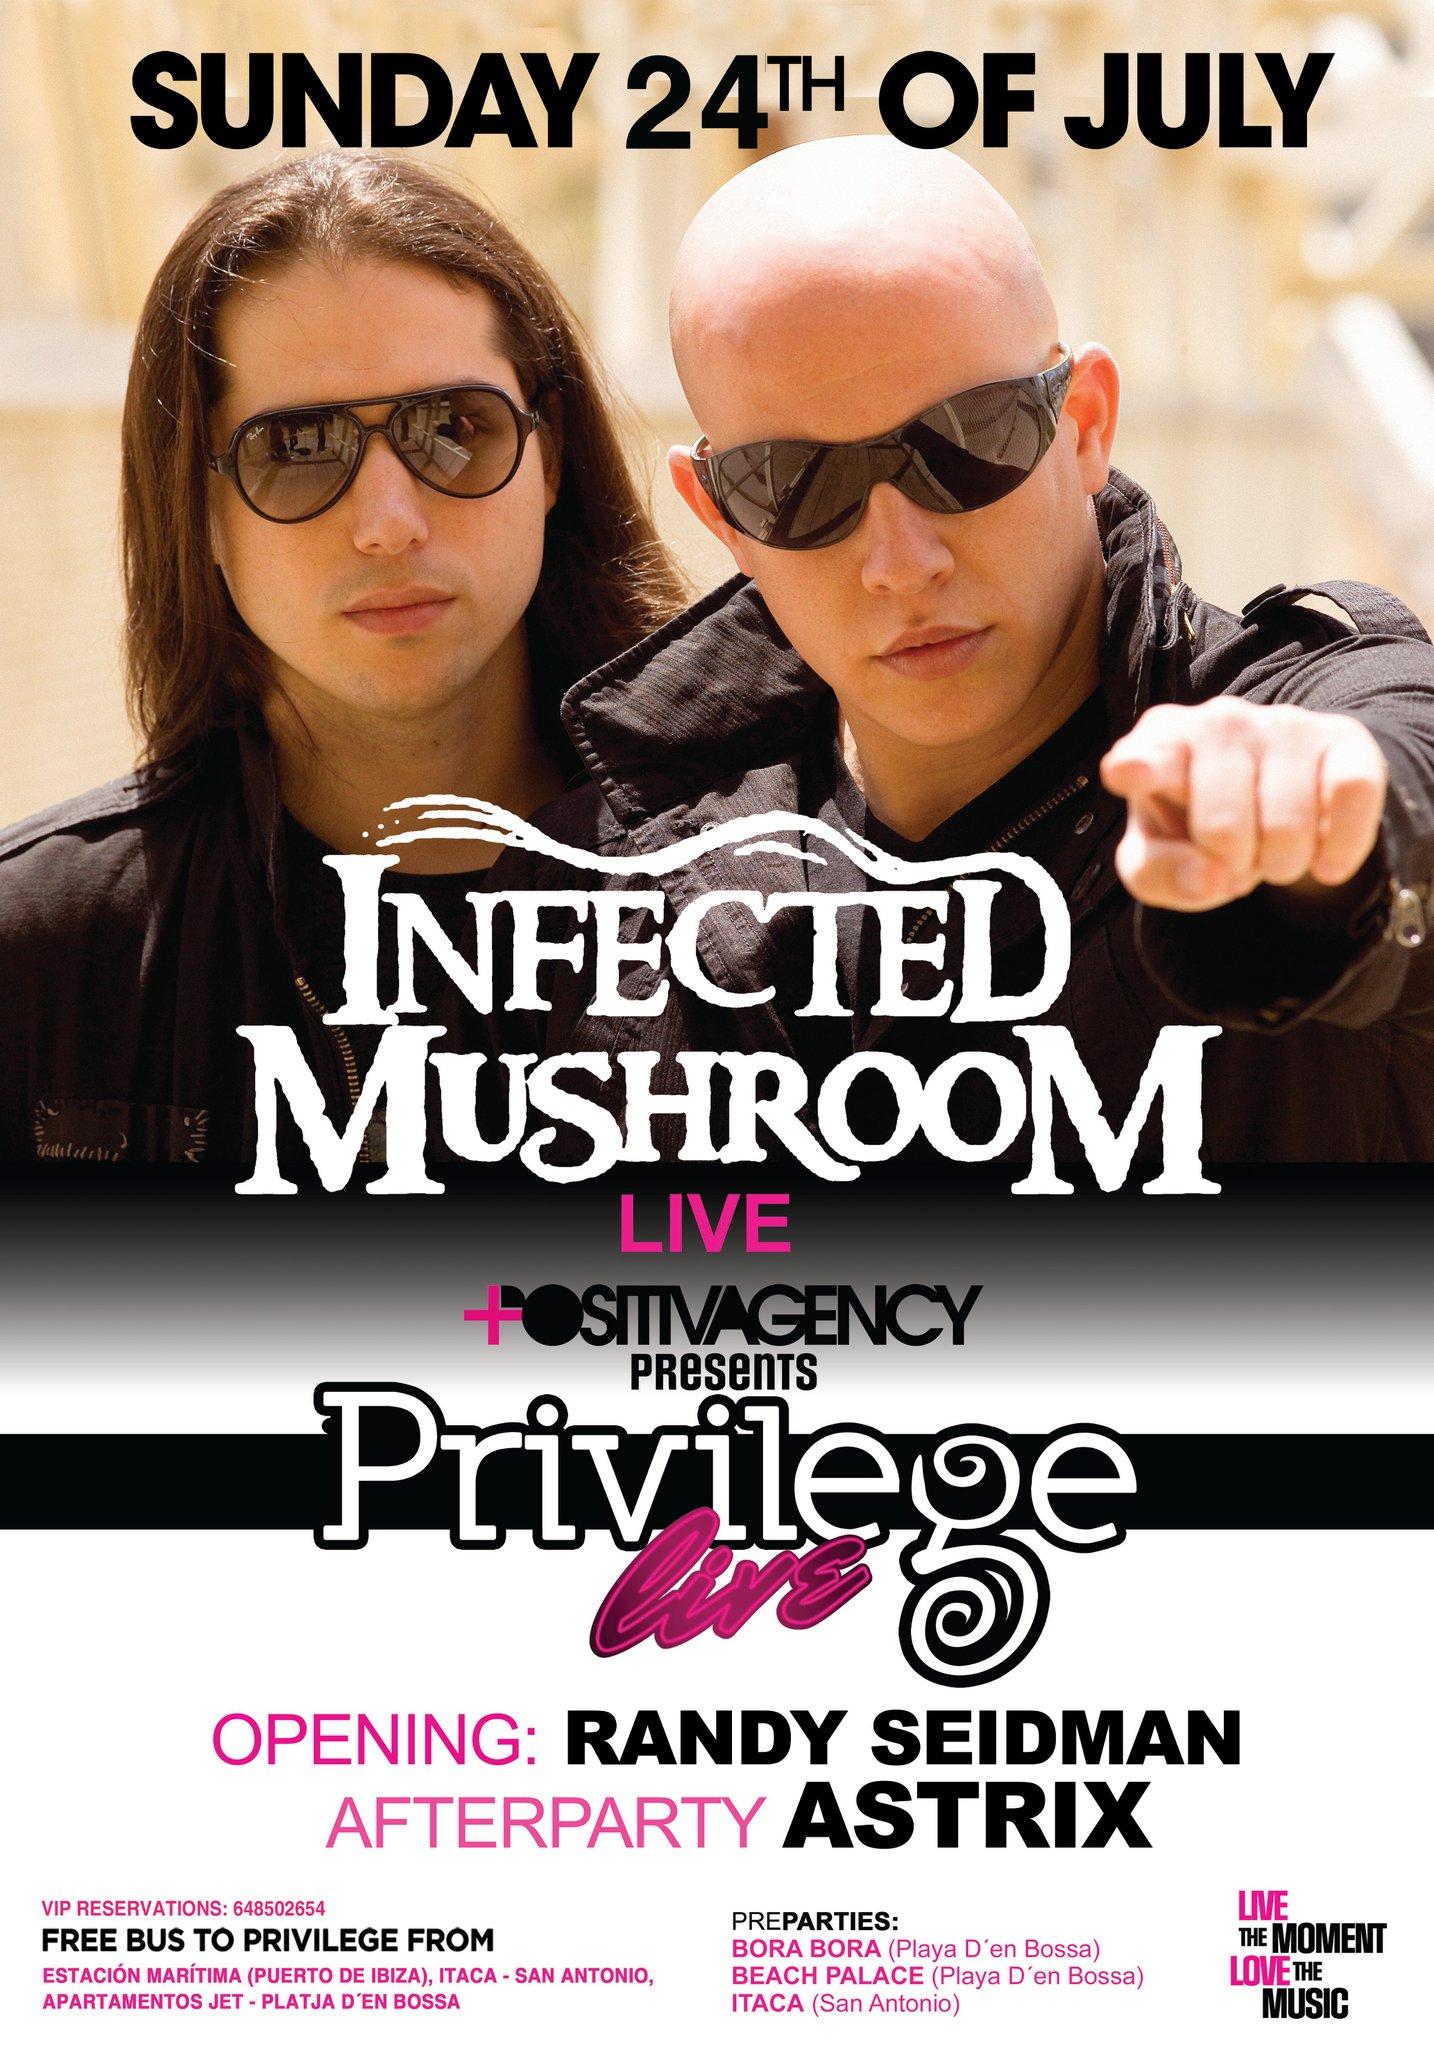 Privilege Live! Infected Mushroom